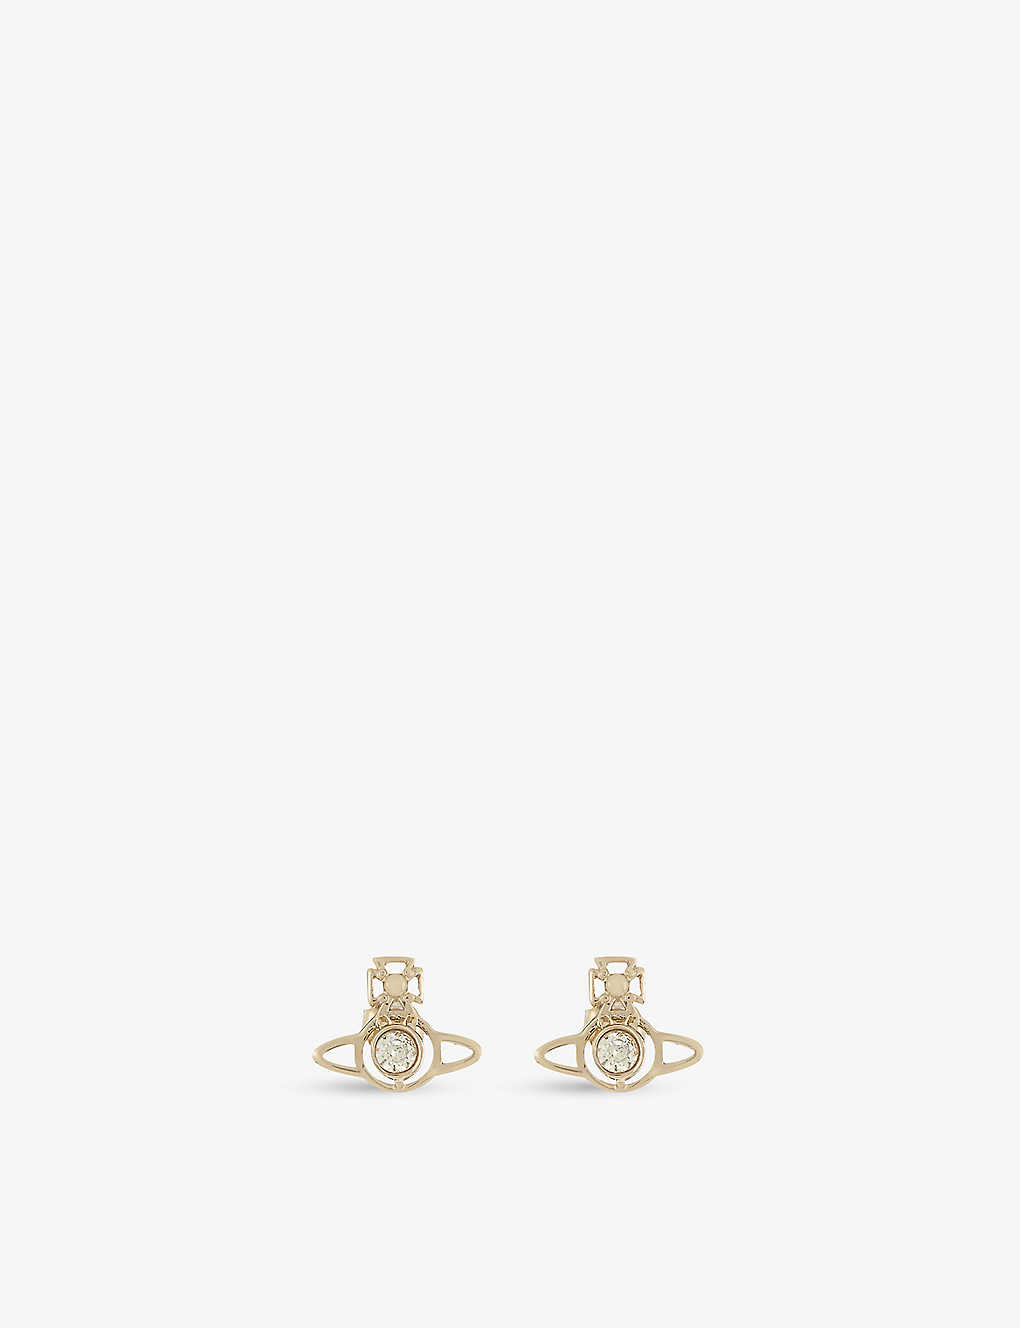 dcd083b3e VIVIENNE WESTWOOD JEWELLERY - Nora stud earrings   Selfridges.com